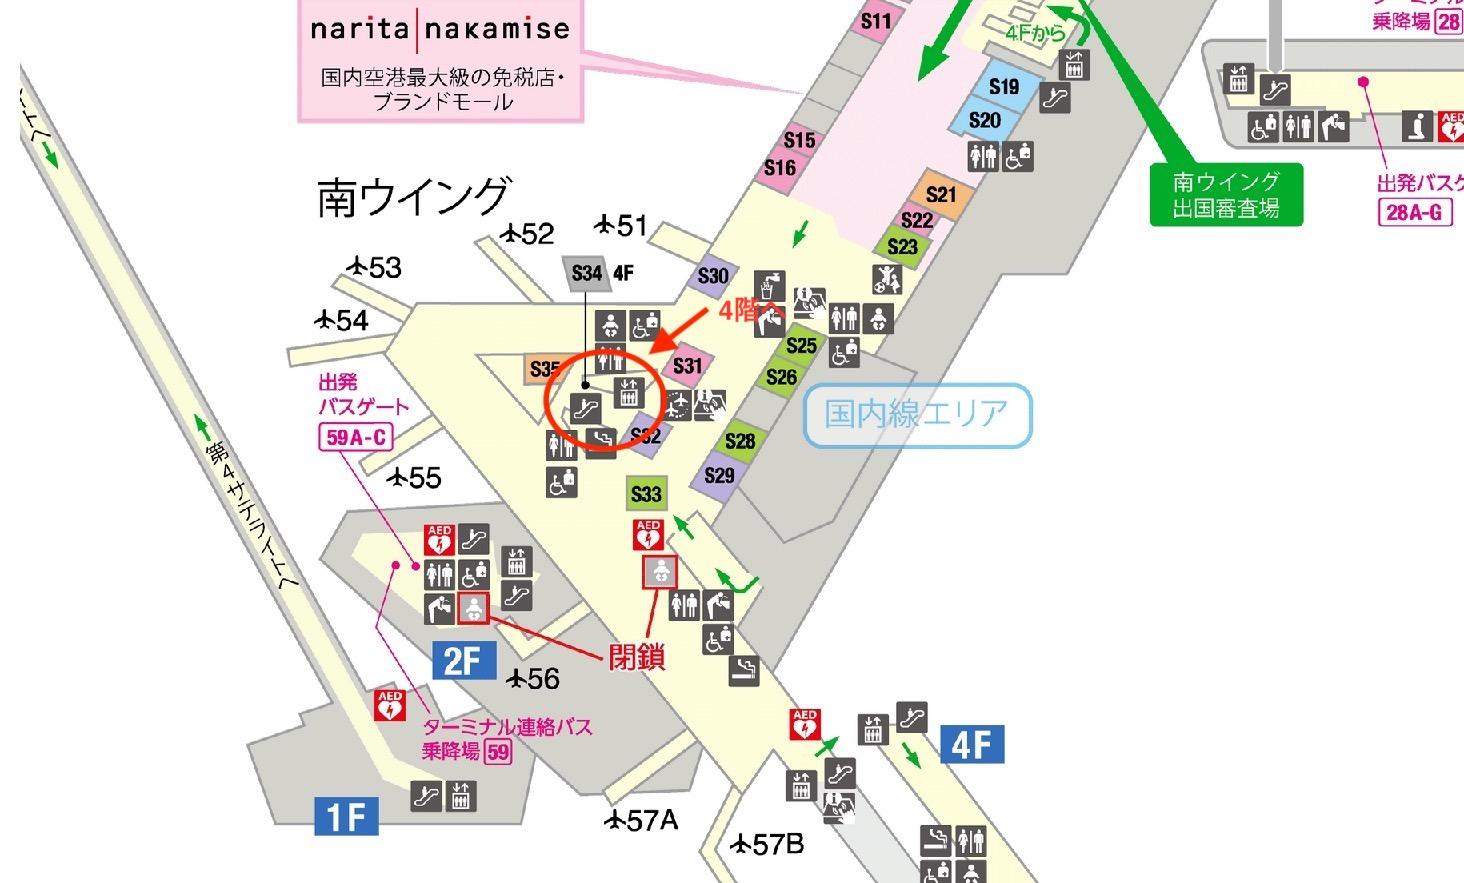 ANA Loungeの地図(成田国際空港)